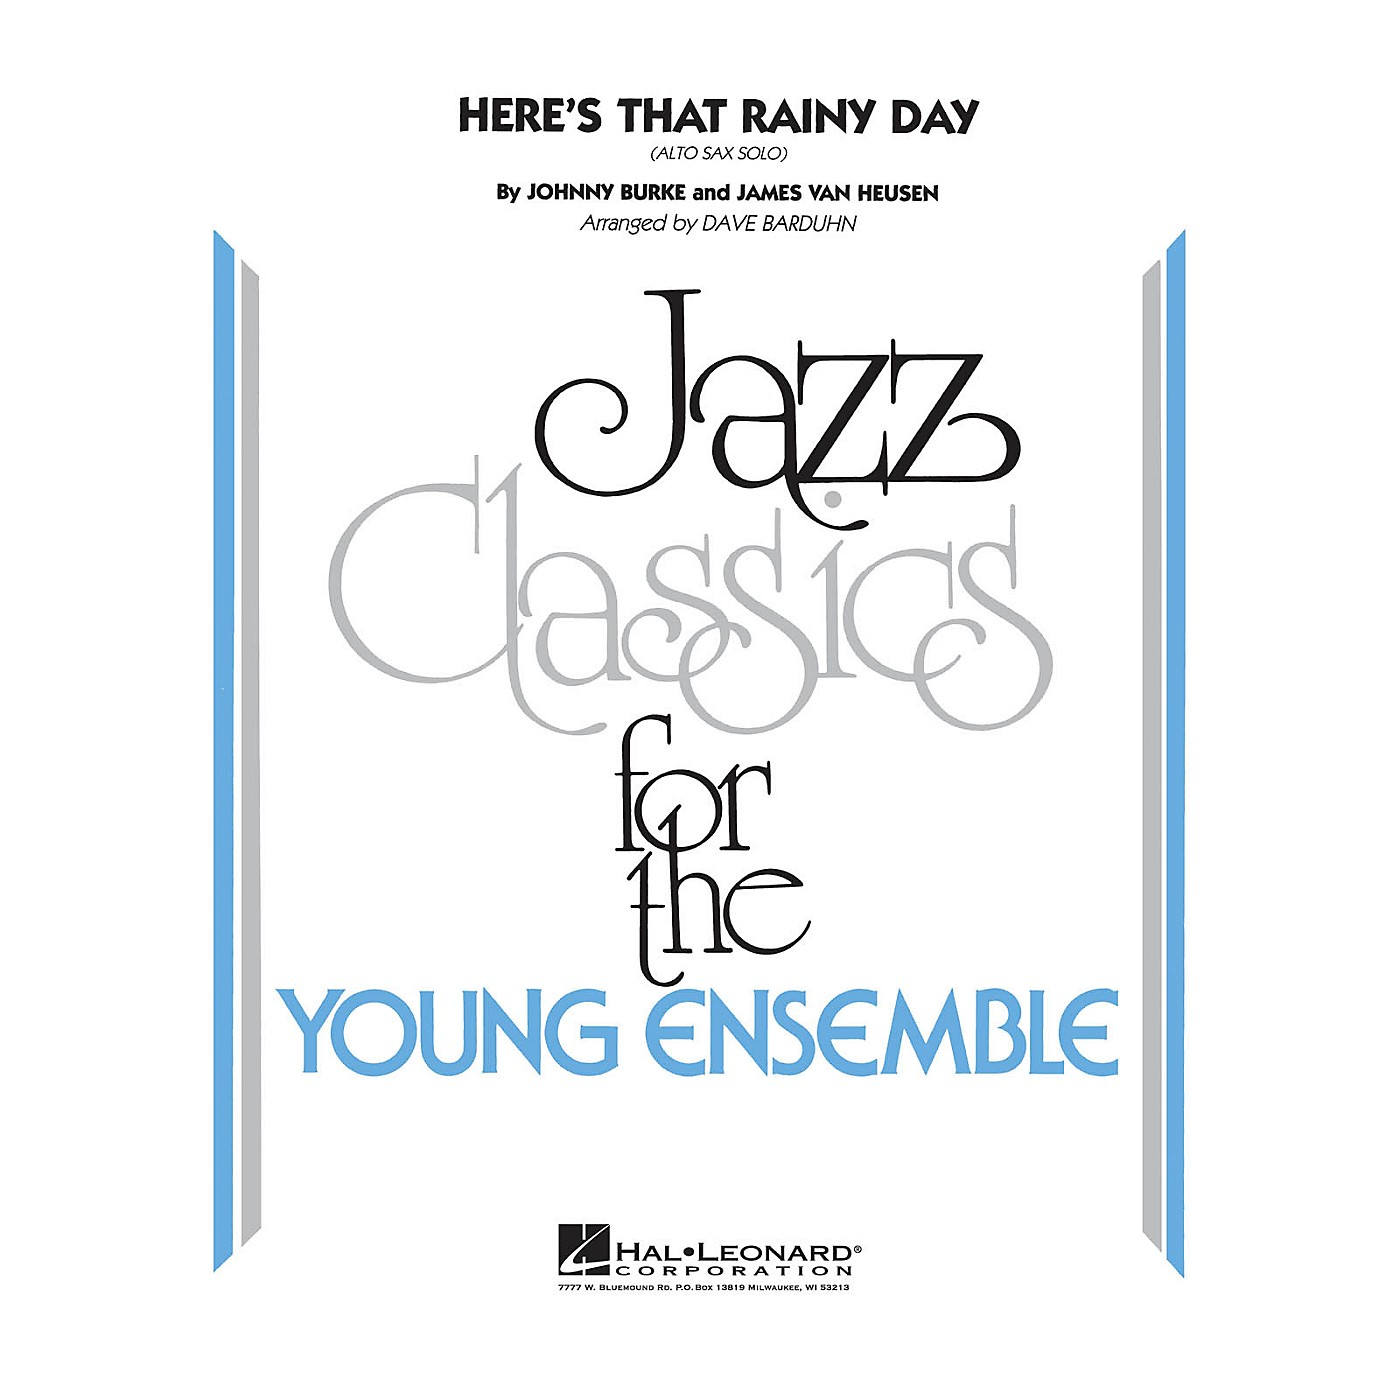 Hal Leonard Here's That Rainy Day Jazz Band Level 3 Arranged by Dave Barduhn thumbnail